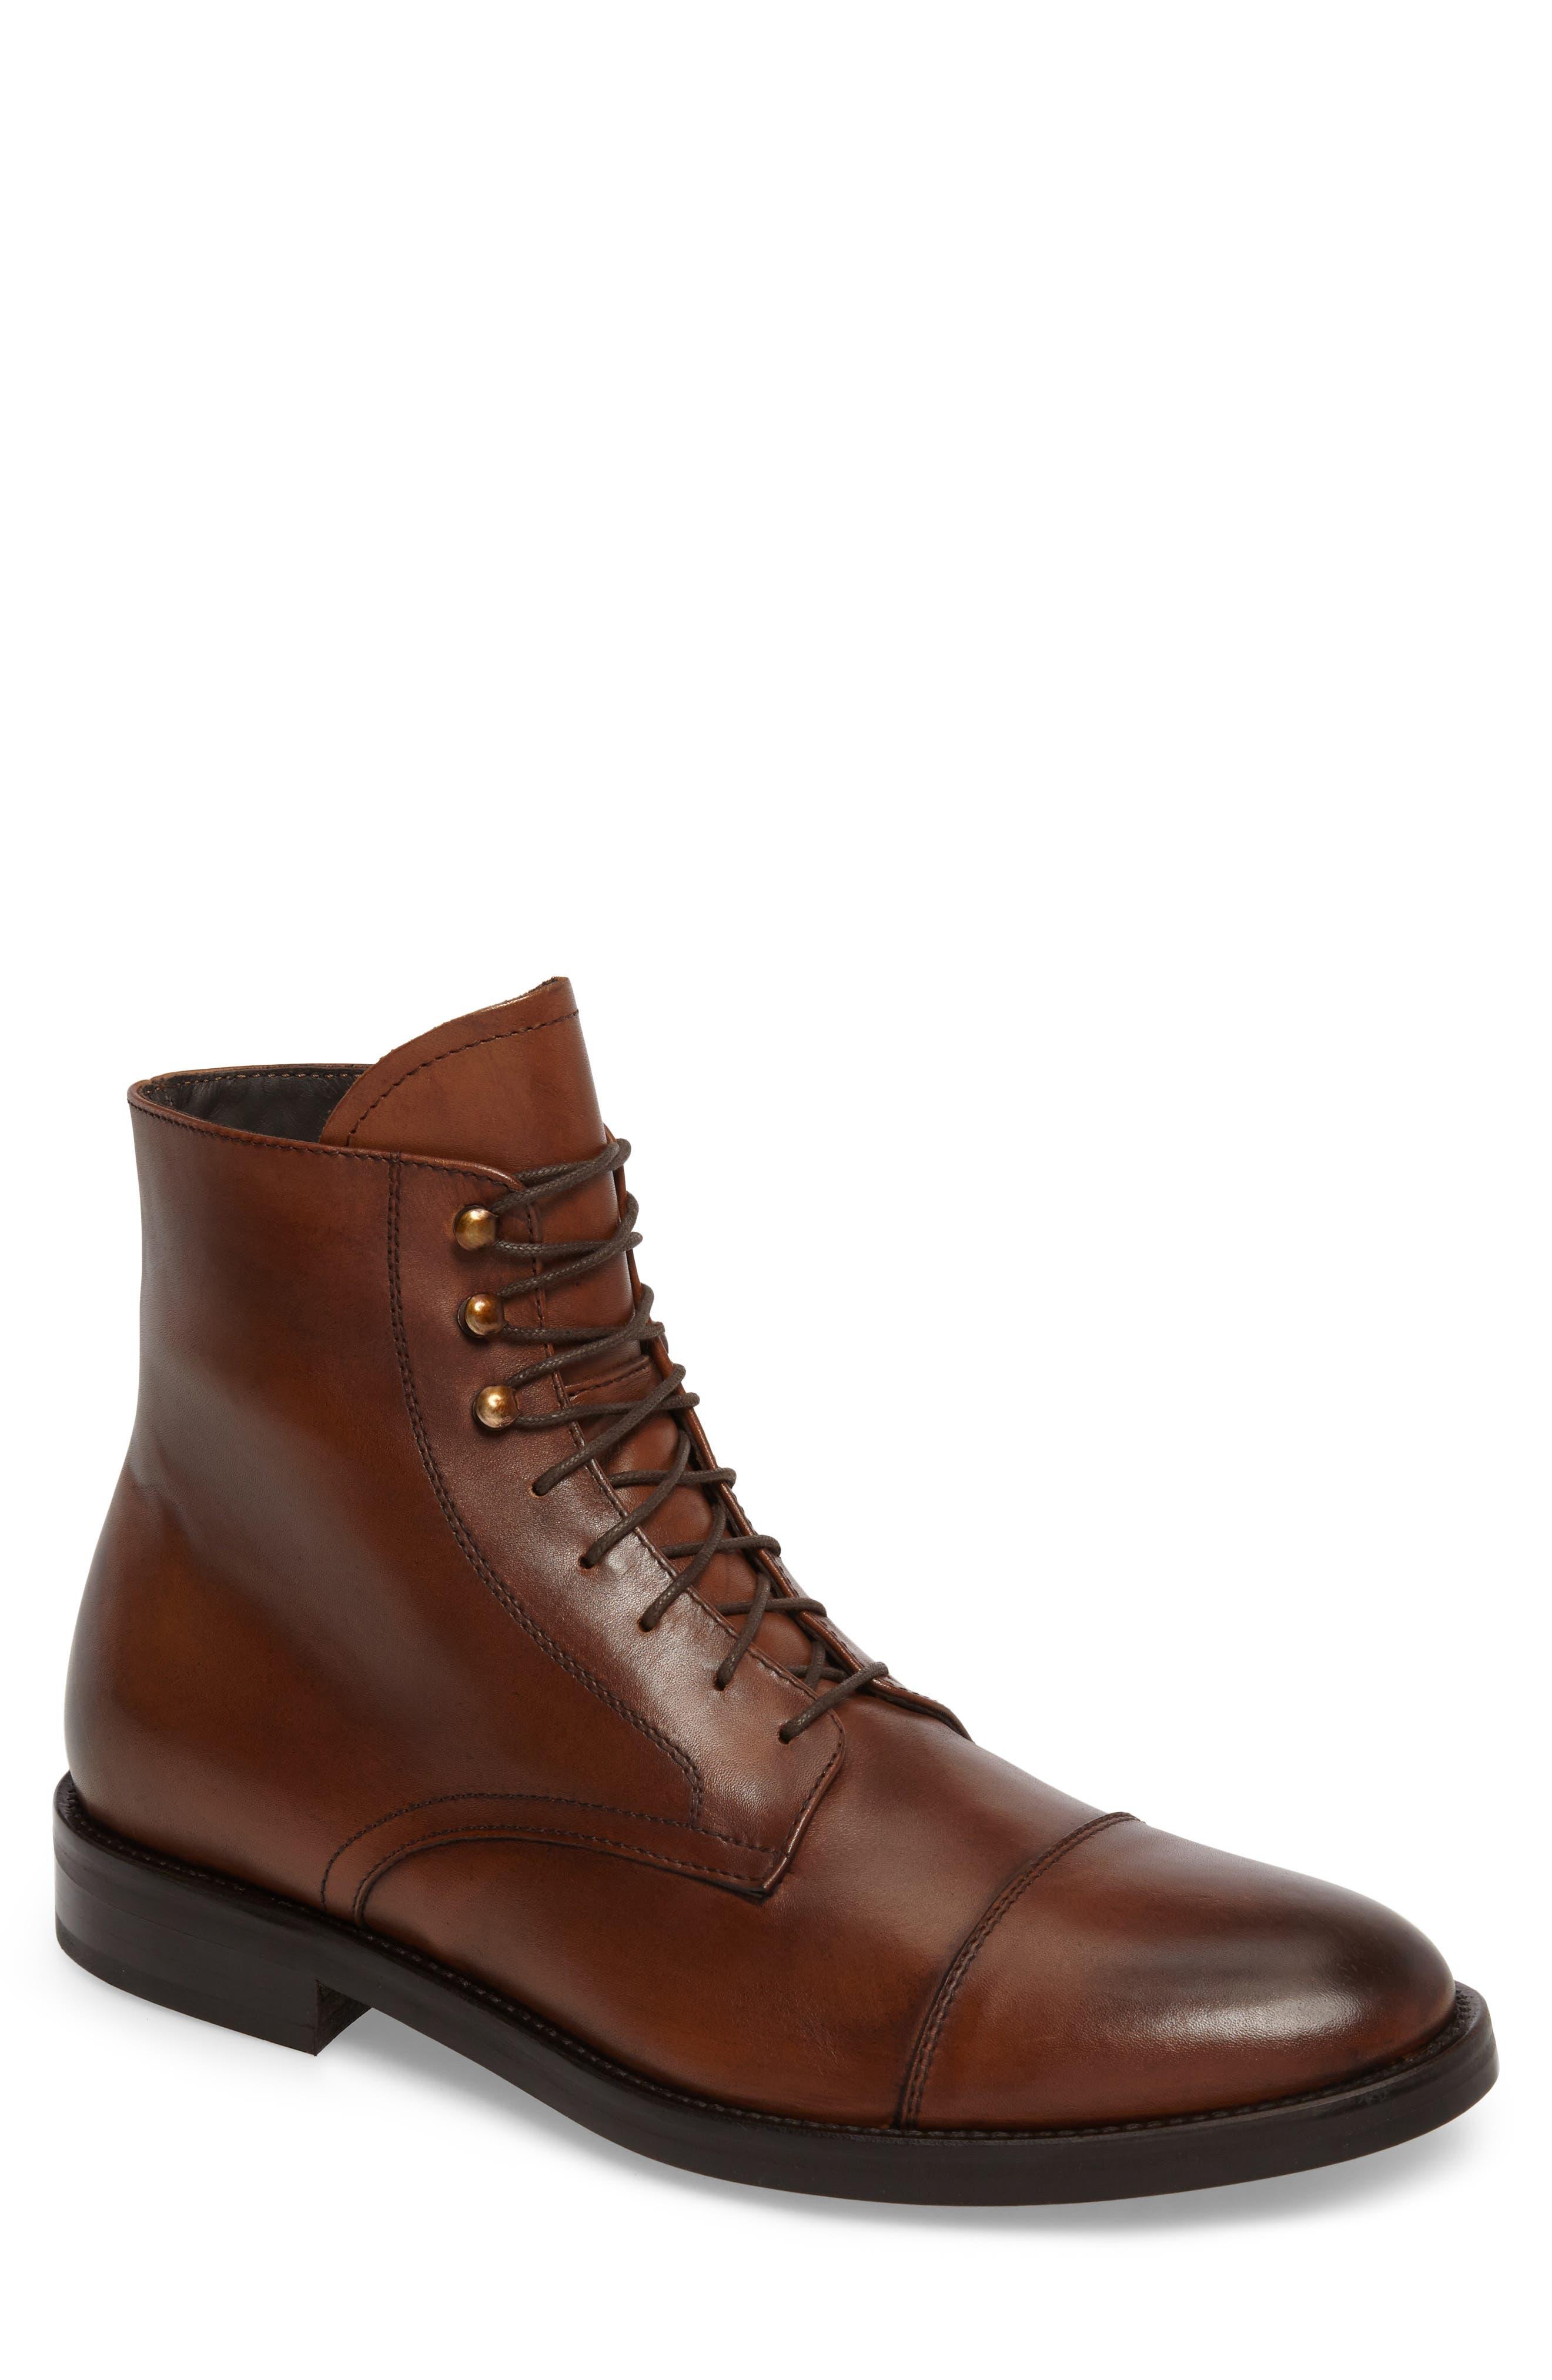 Henri Cap Toe Boot,                             Main thumbnail 1, color,                             Cuoio Leather